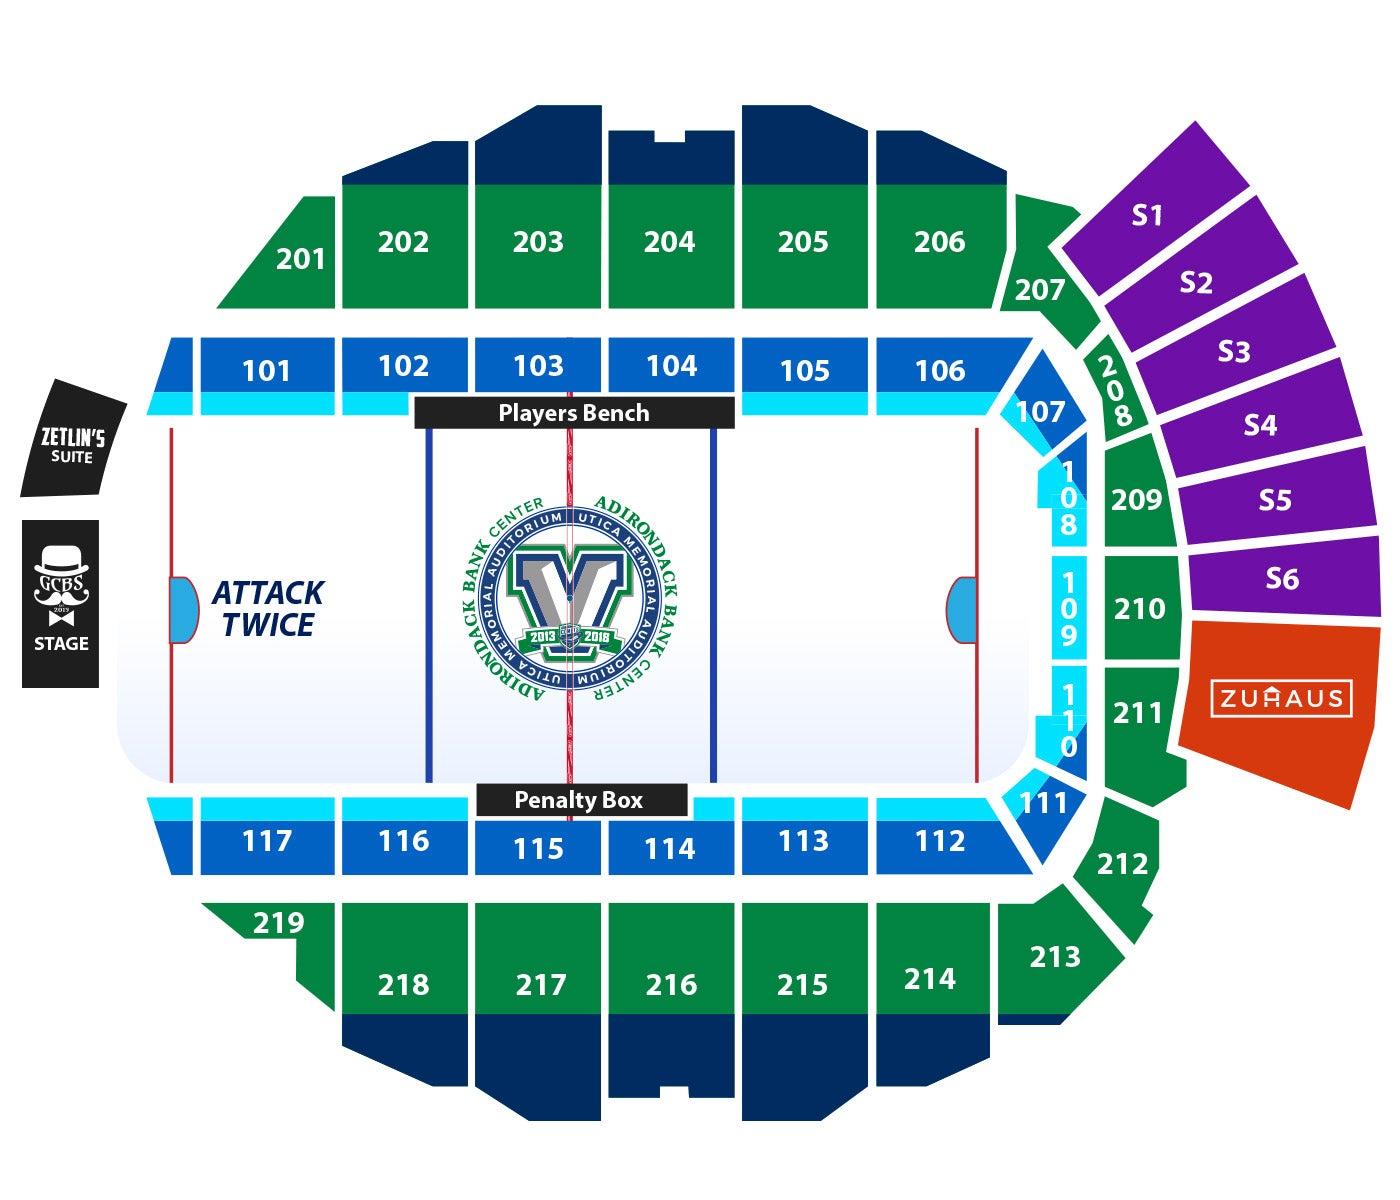 tickets_seatmap-0d6ab43525.jpg